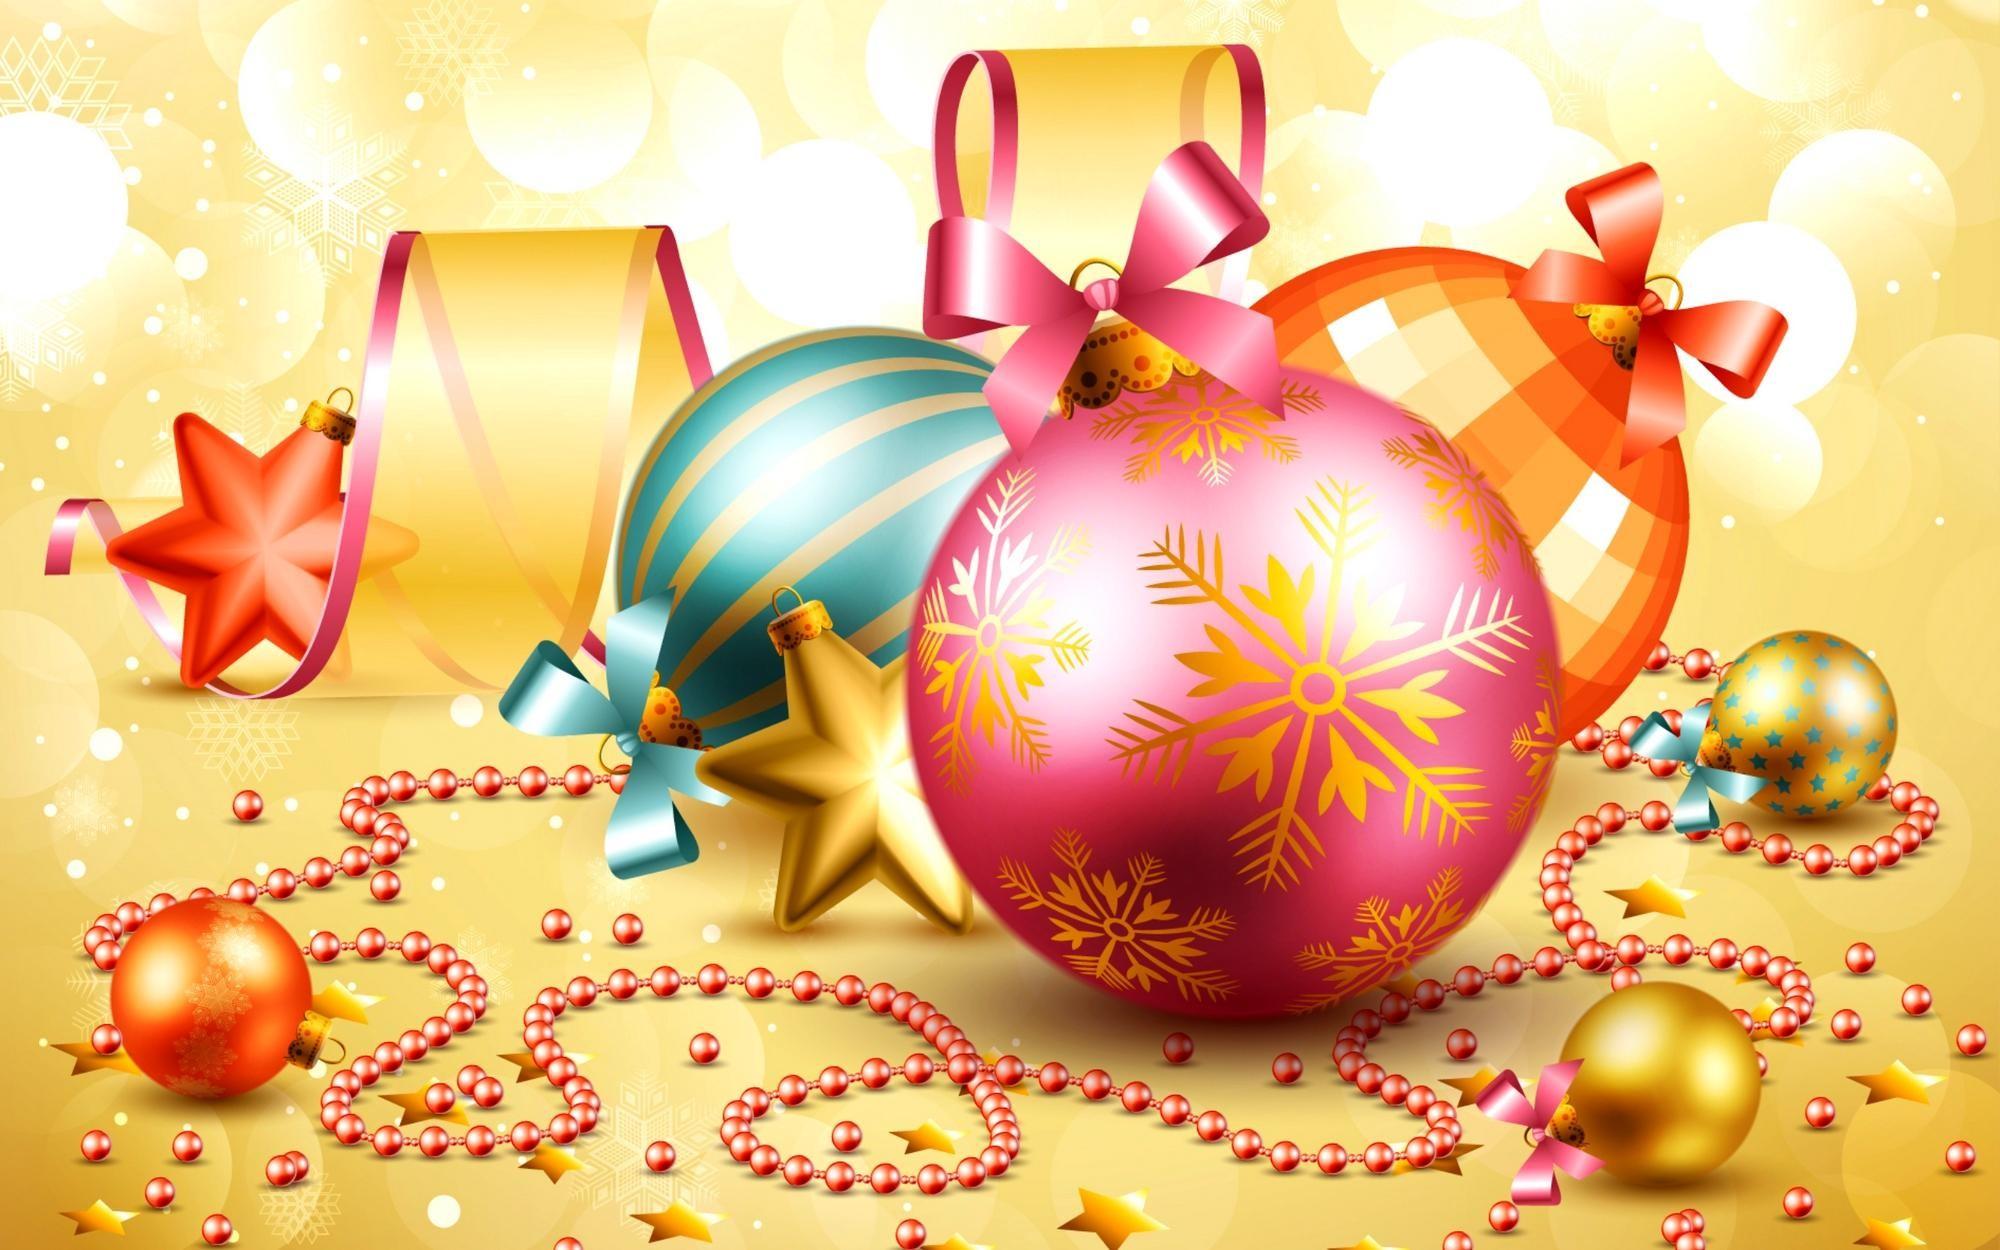 Christmas Ornaments Wallpaper for Desktop (80+ images)